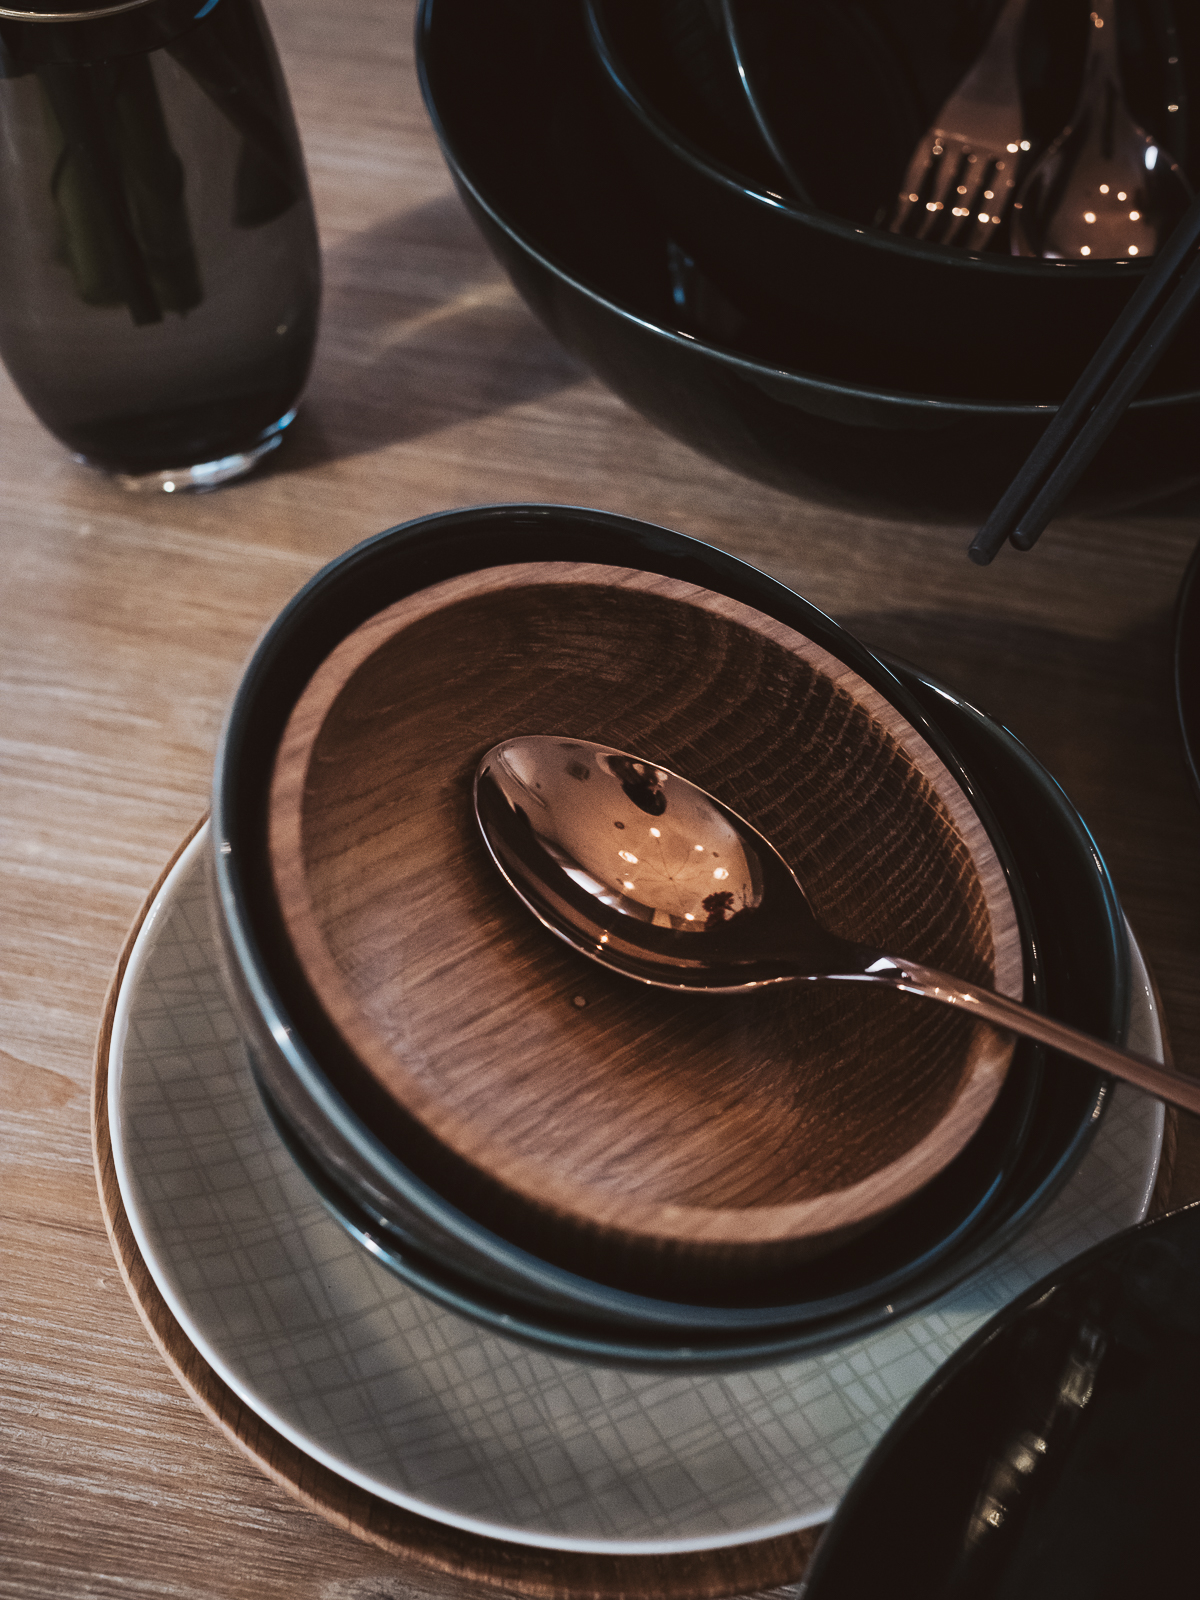 Ingolstadt Village Chinese New Year Lifestyle Shopping & Home Cooking - Olympus EM1Markii 2512 - Yes! Please Enjoy by Fanning Tseng-106.jpg